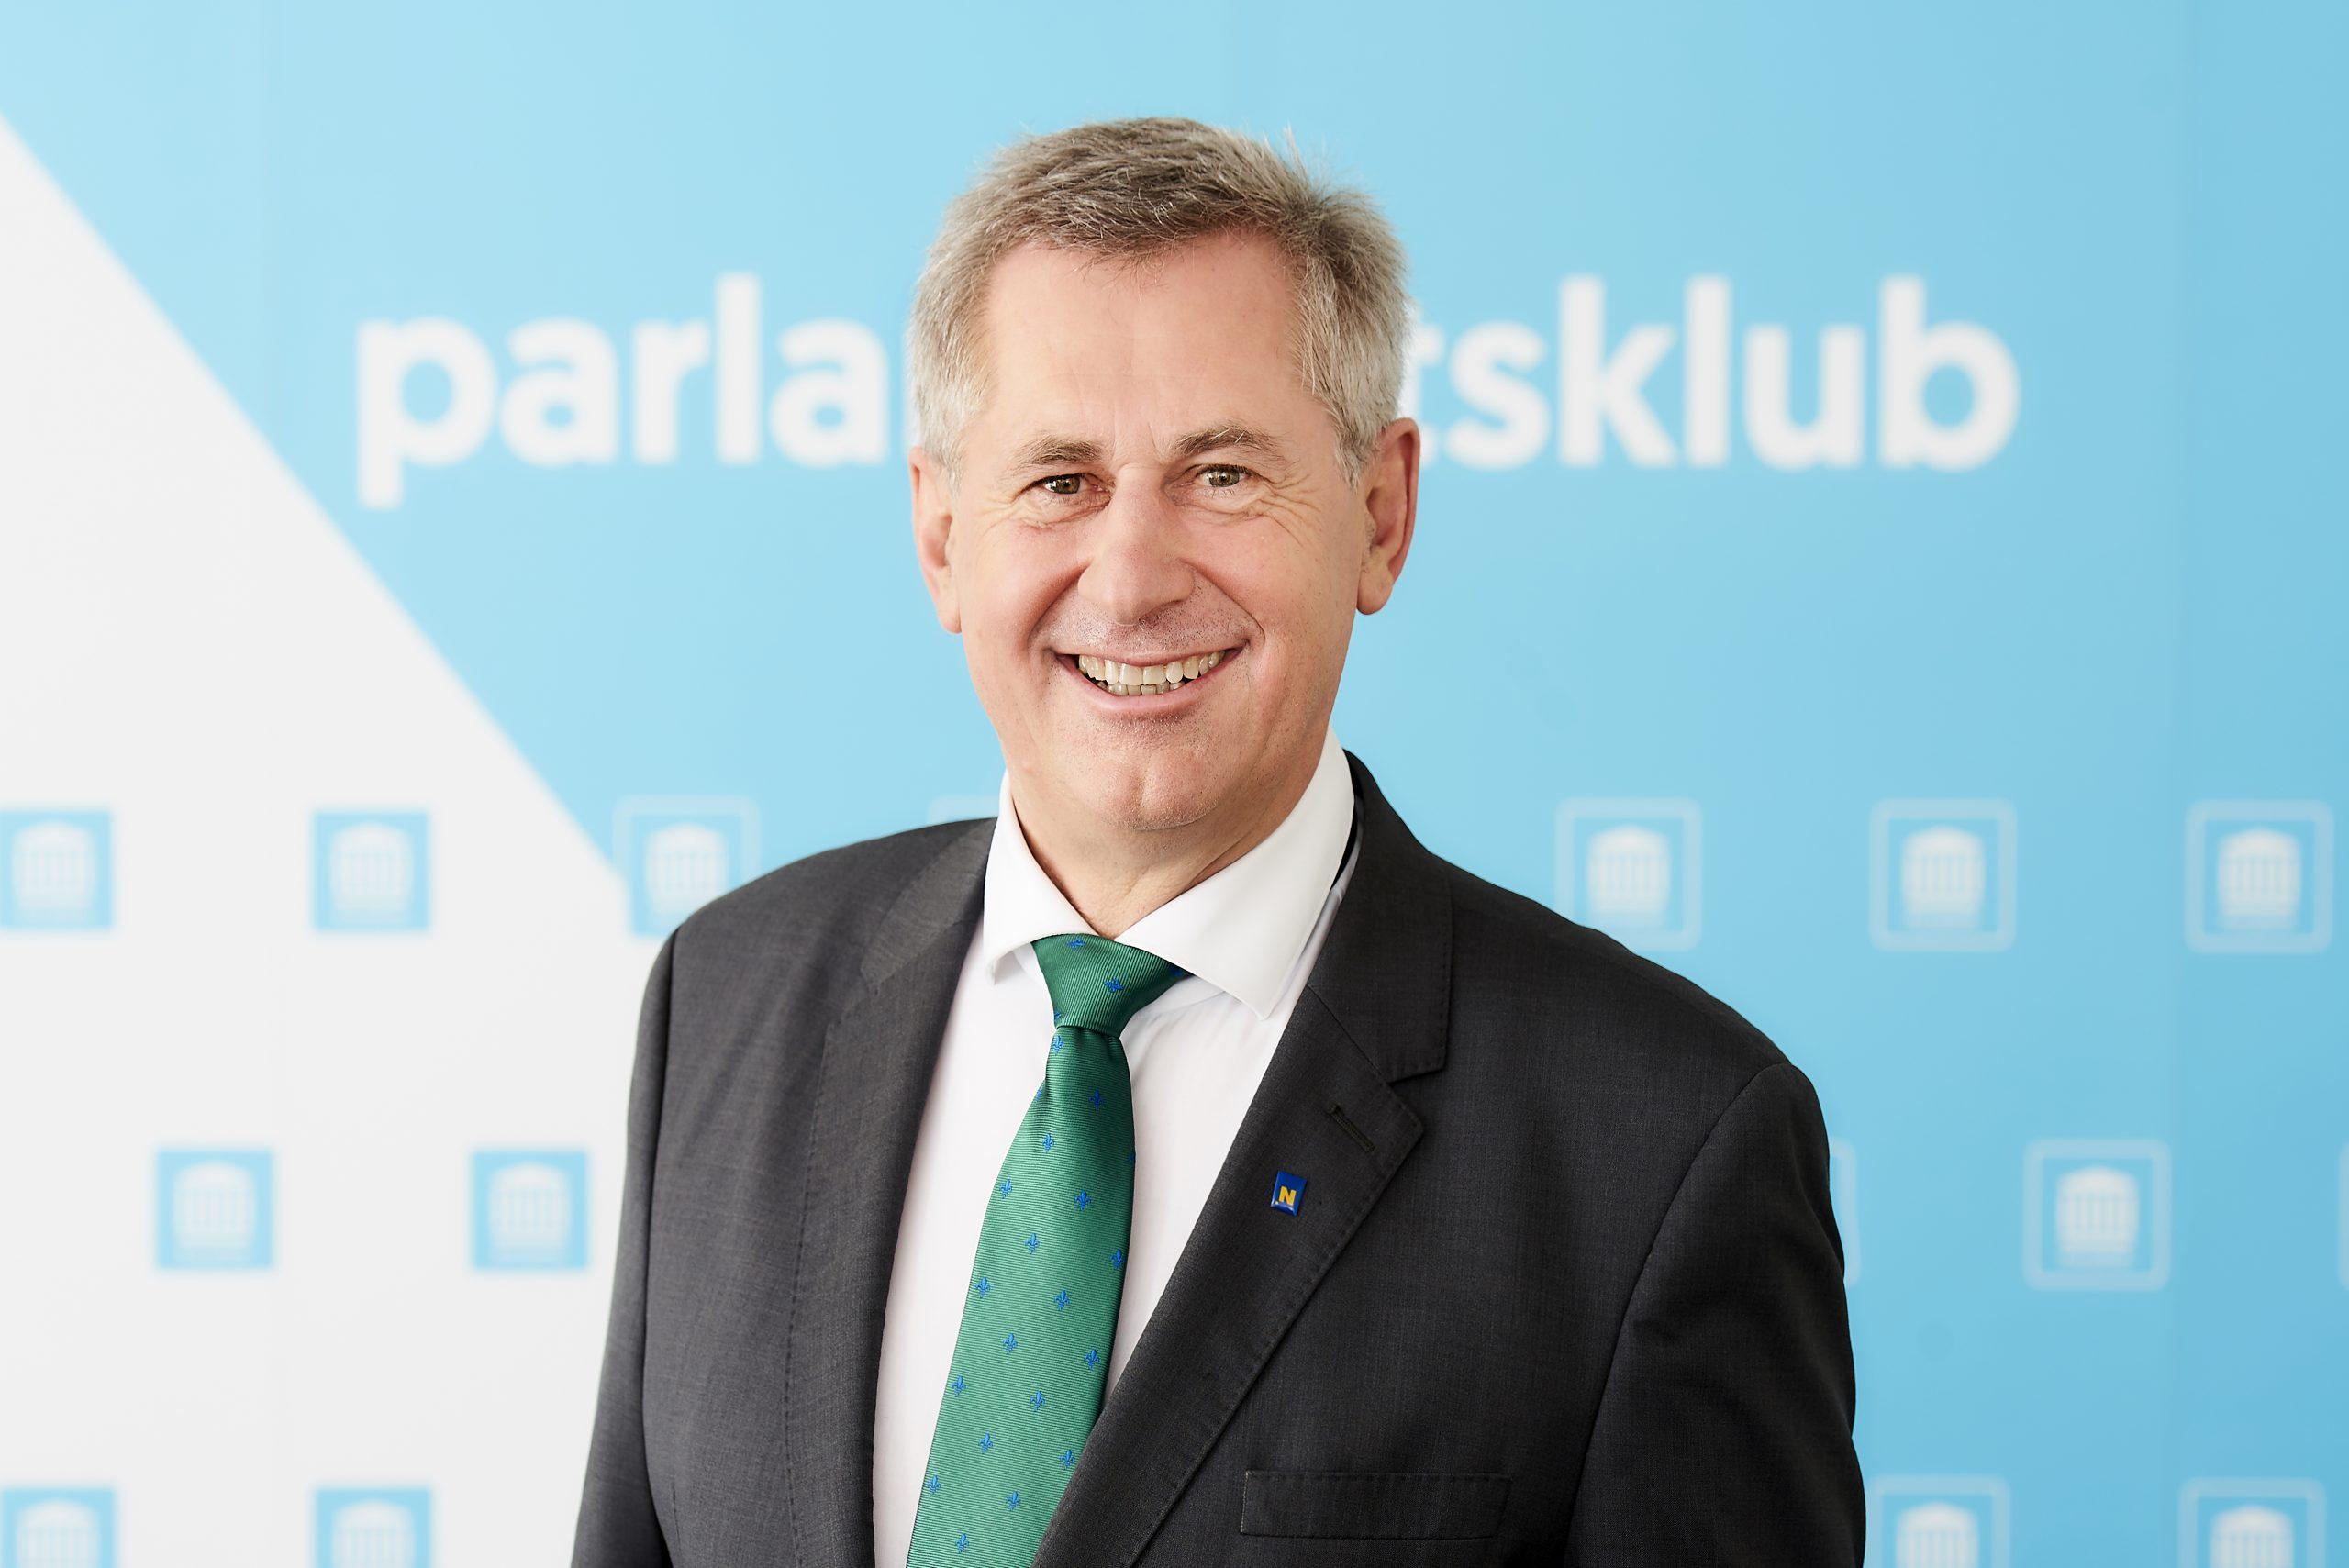 Bundesrat Martin Preineder Parlamentsklub / 2020 © ÖVP Klub/Sabine Klimpt